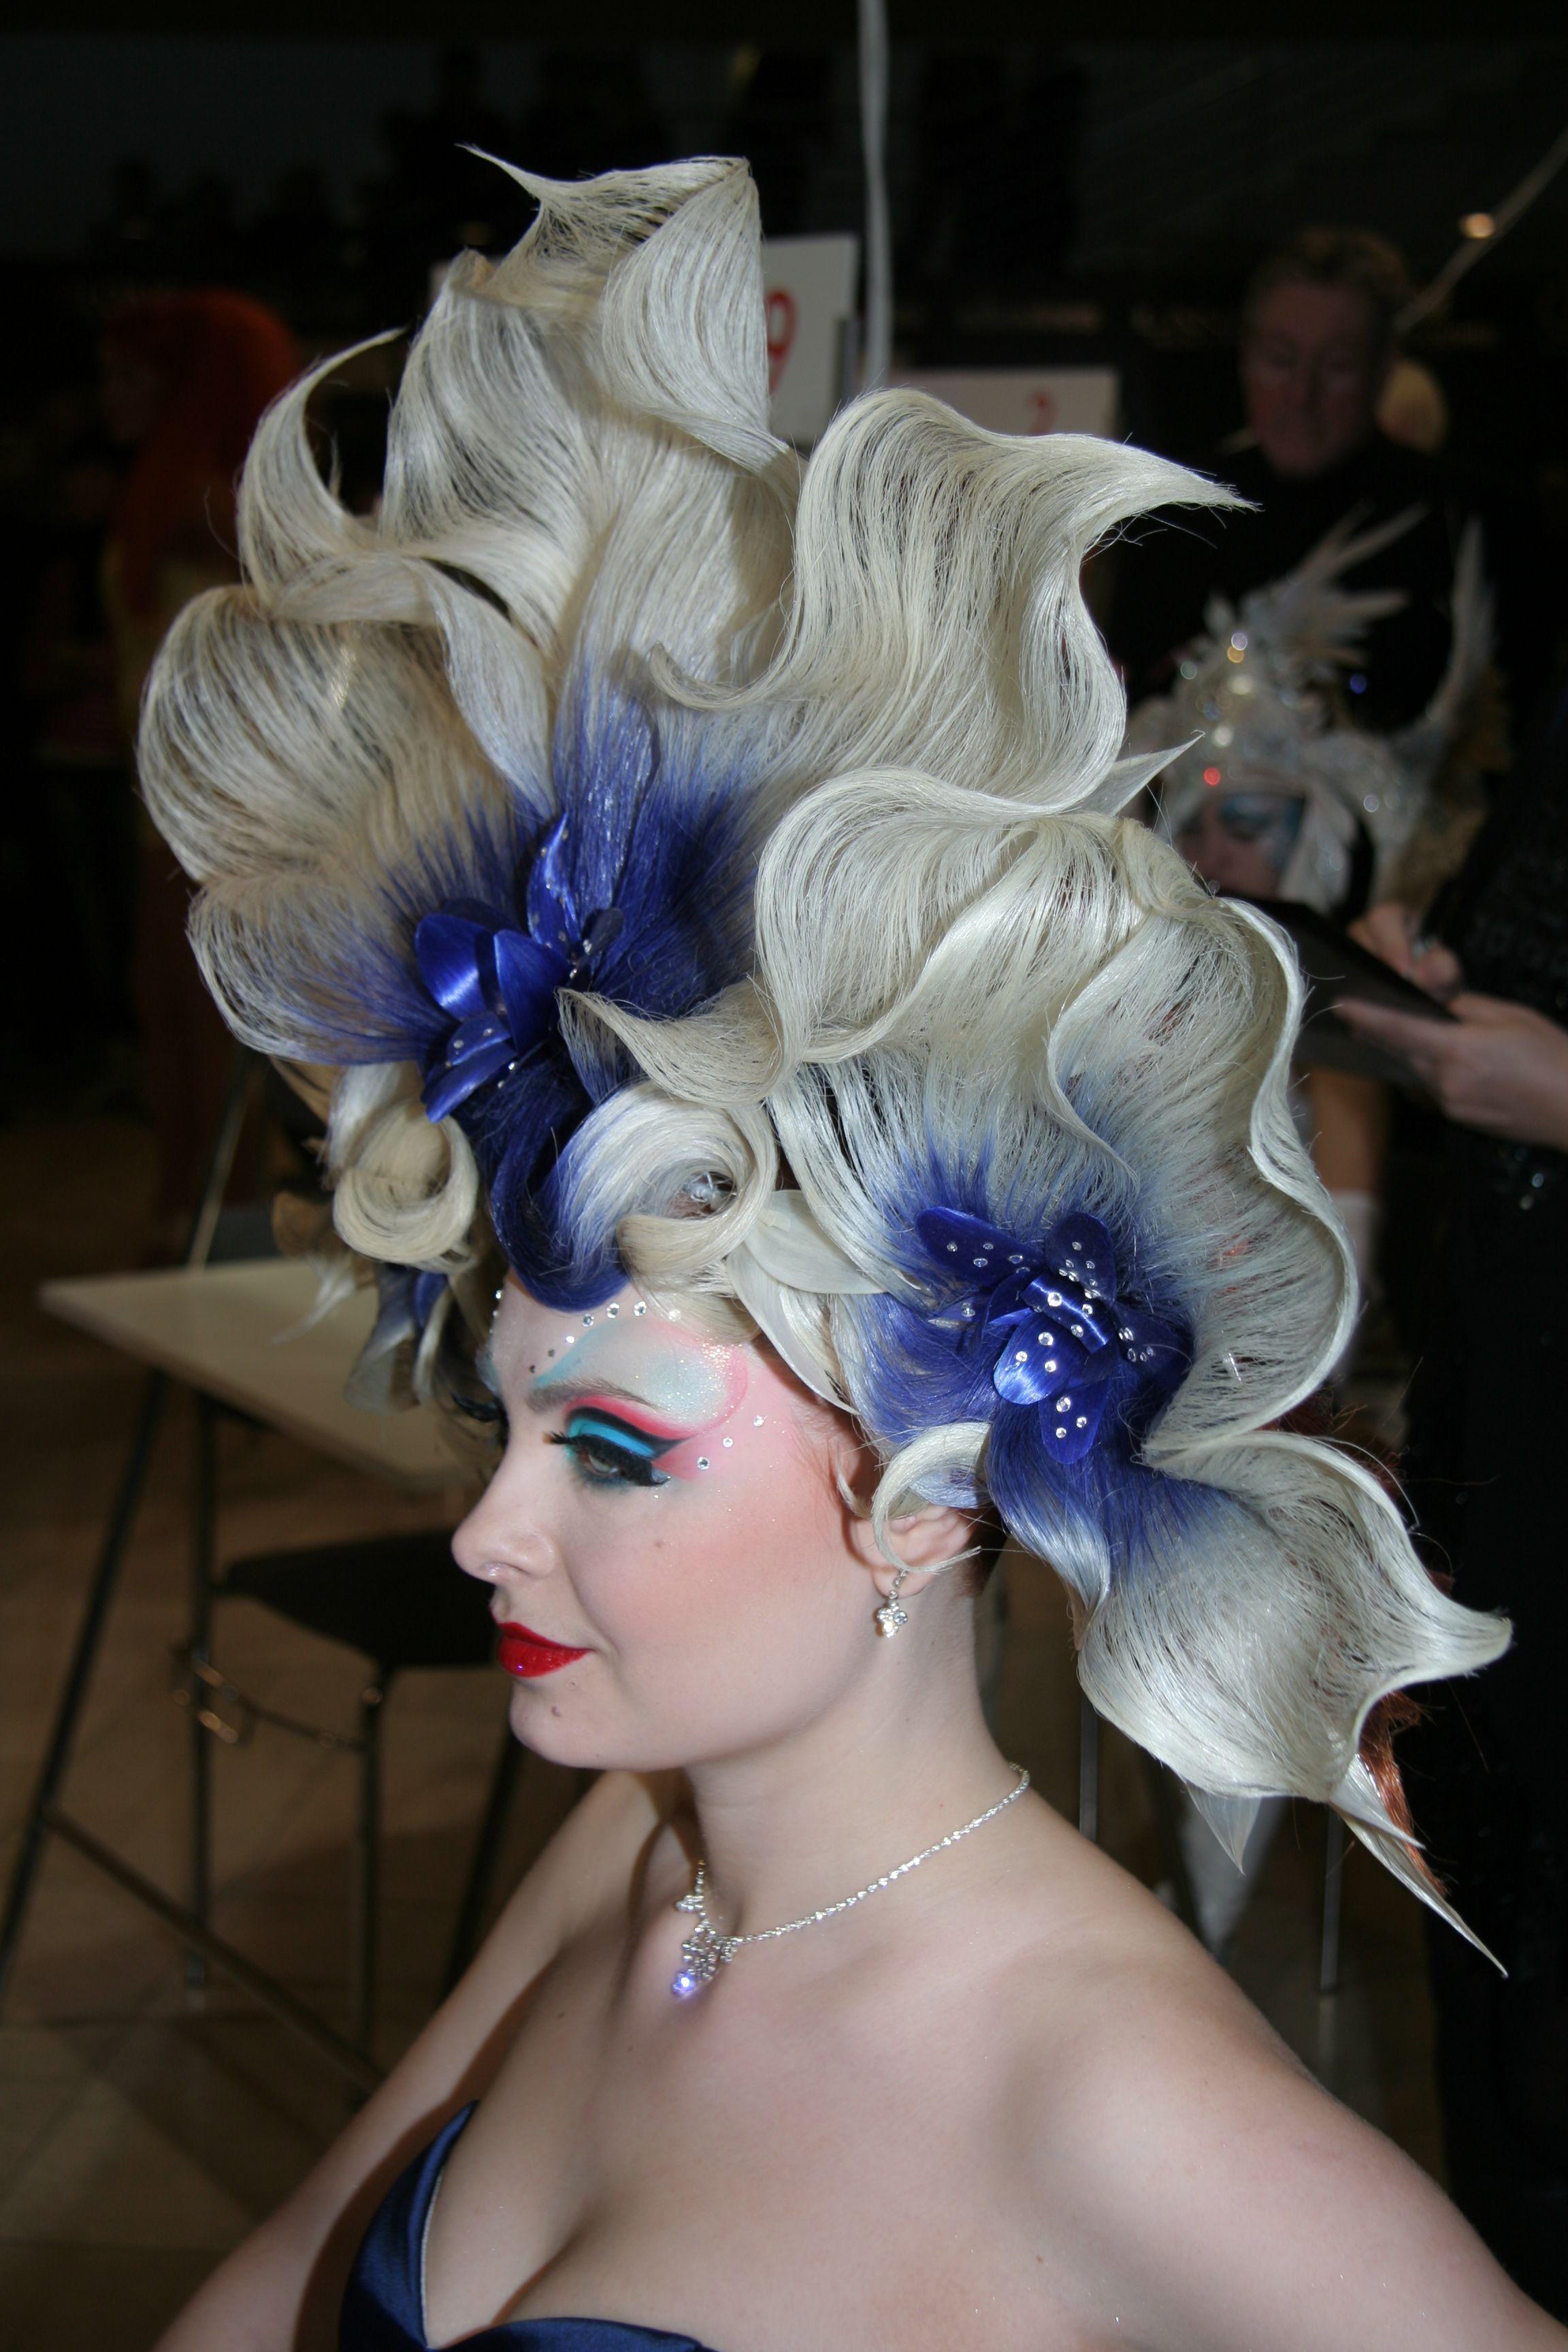 Fantasy Hairstyle Fantasy Hair Artistic Hair Competition Hair